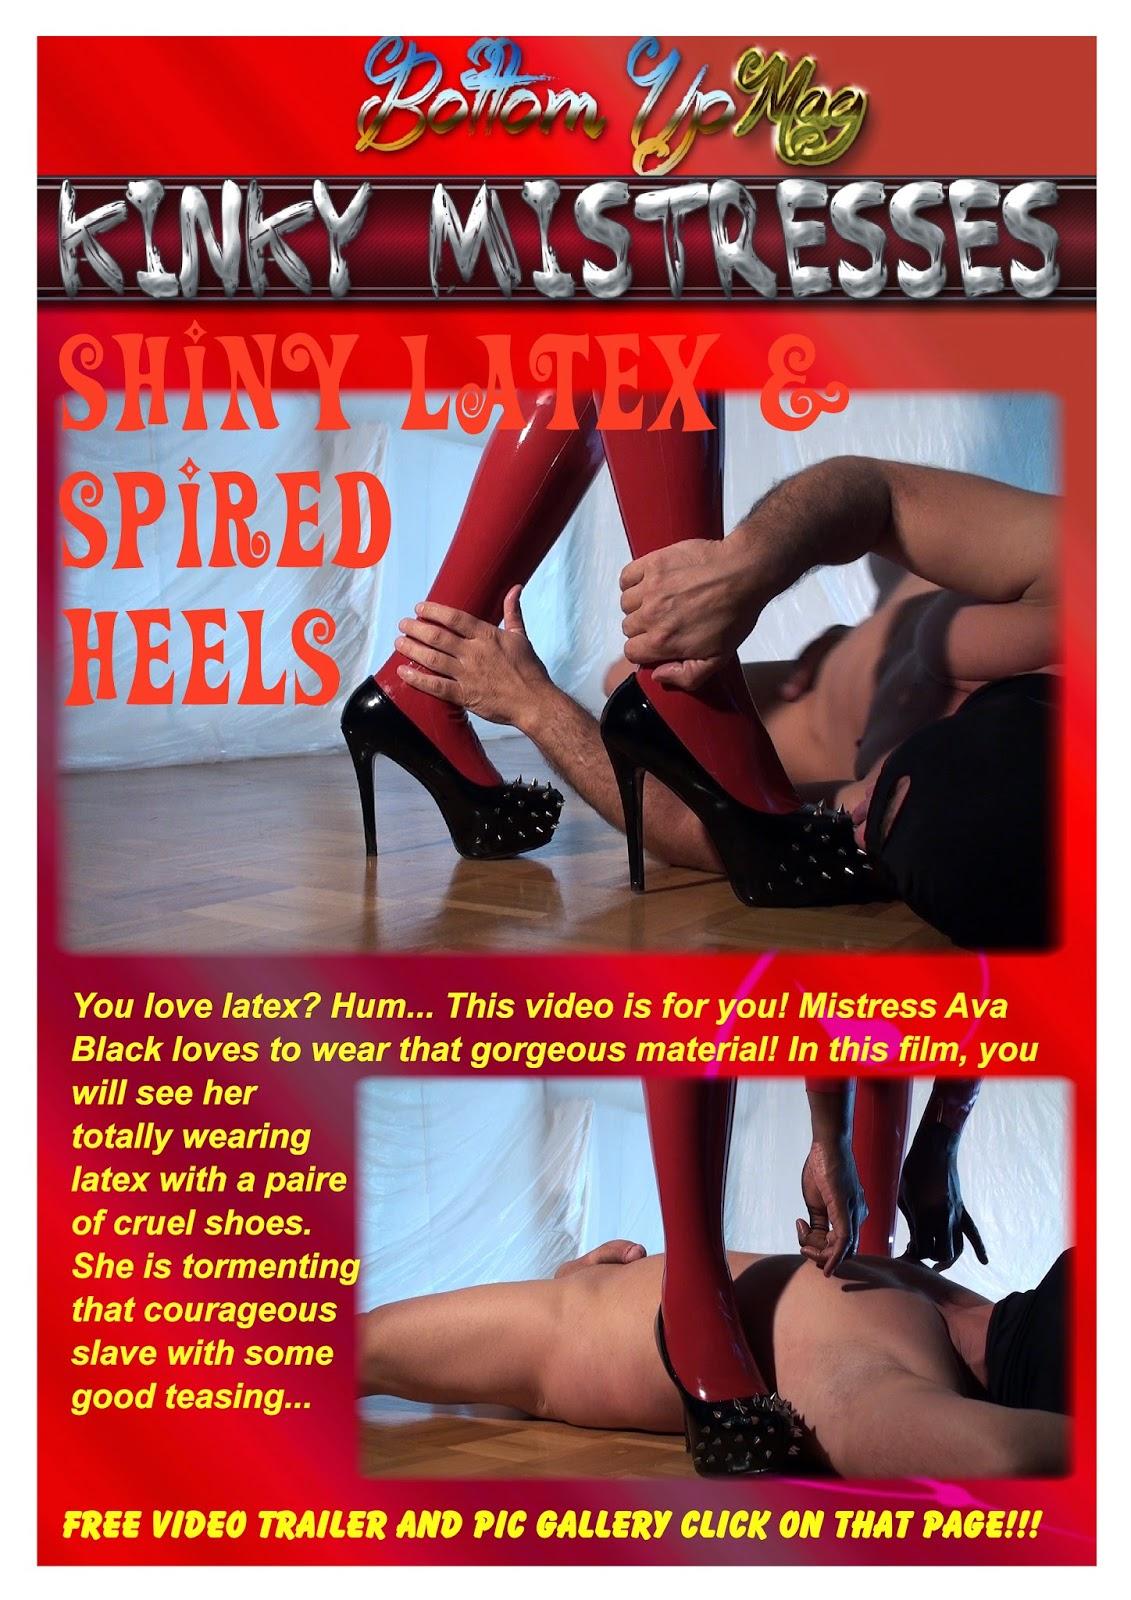 http://www.kinkymistresses.com/affiliate/promo/82d32f/1/707/774138/